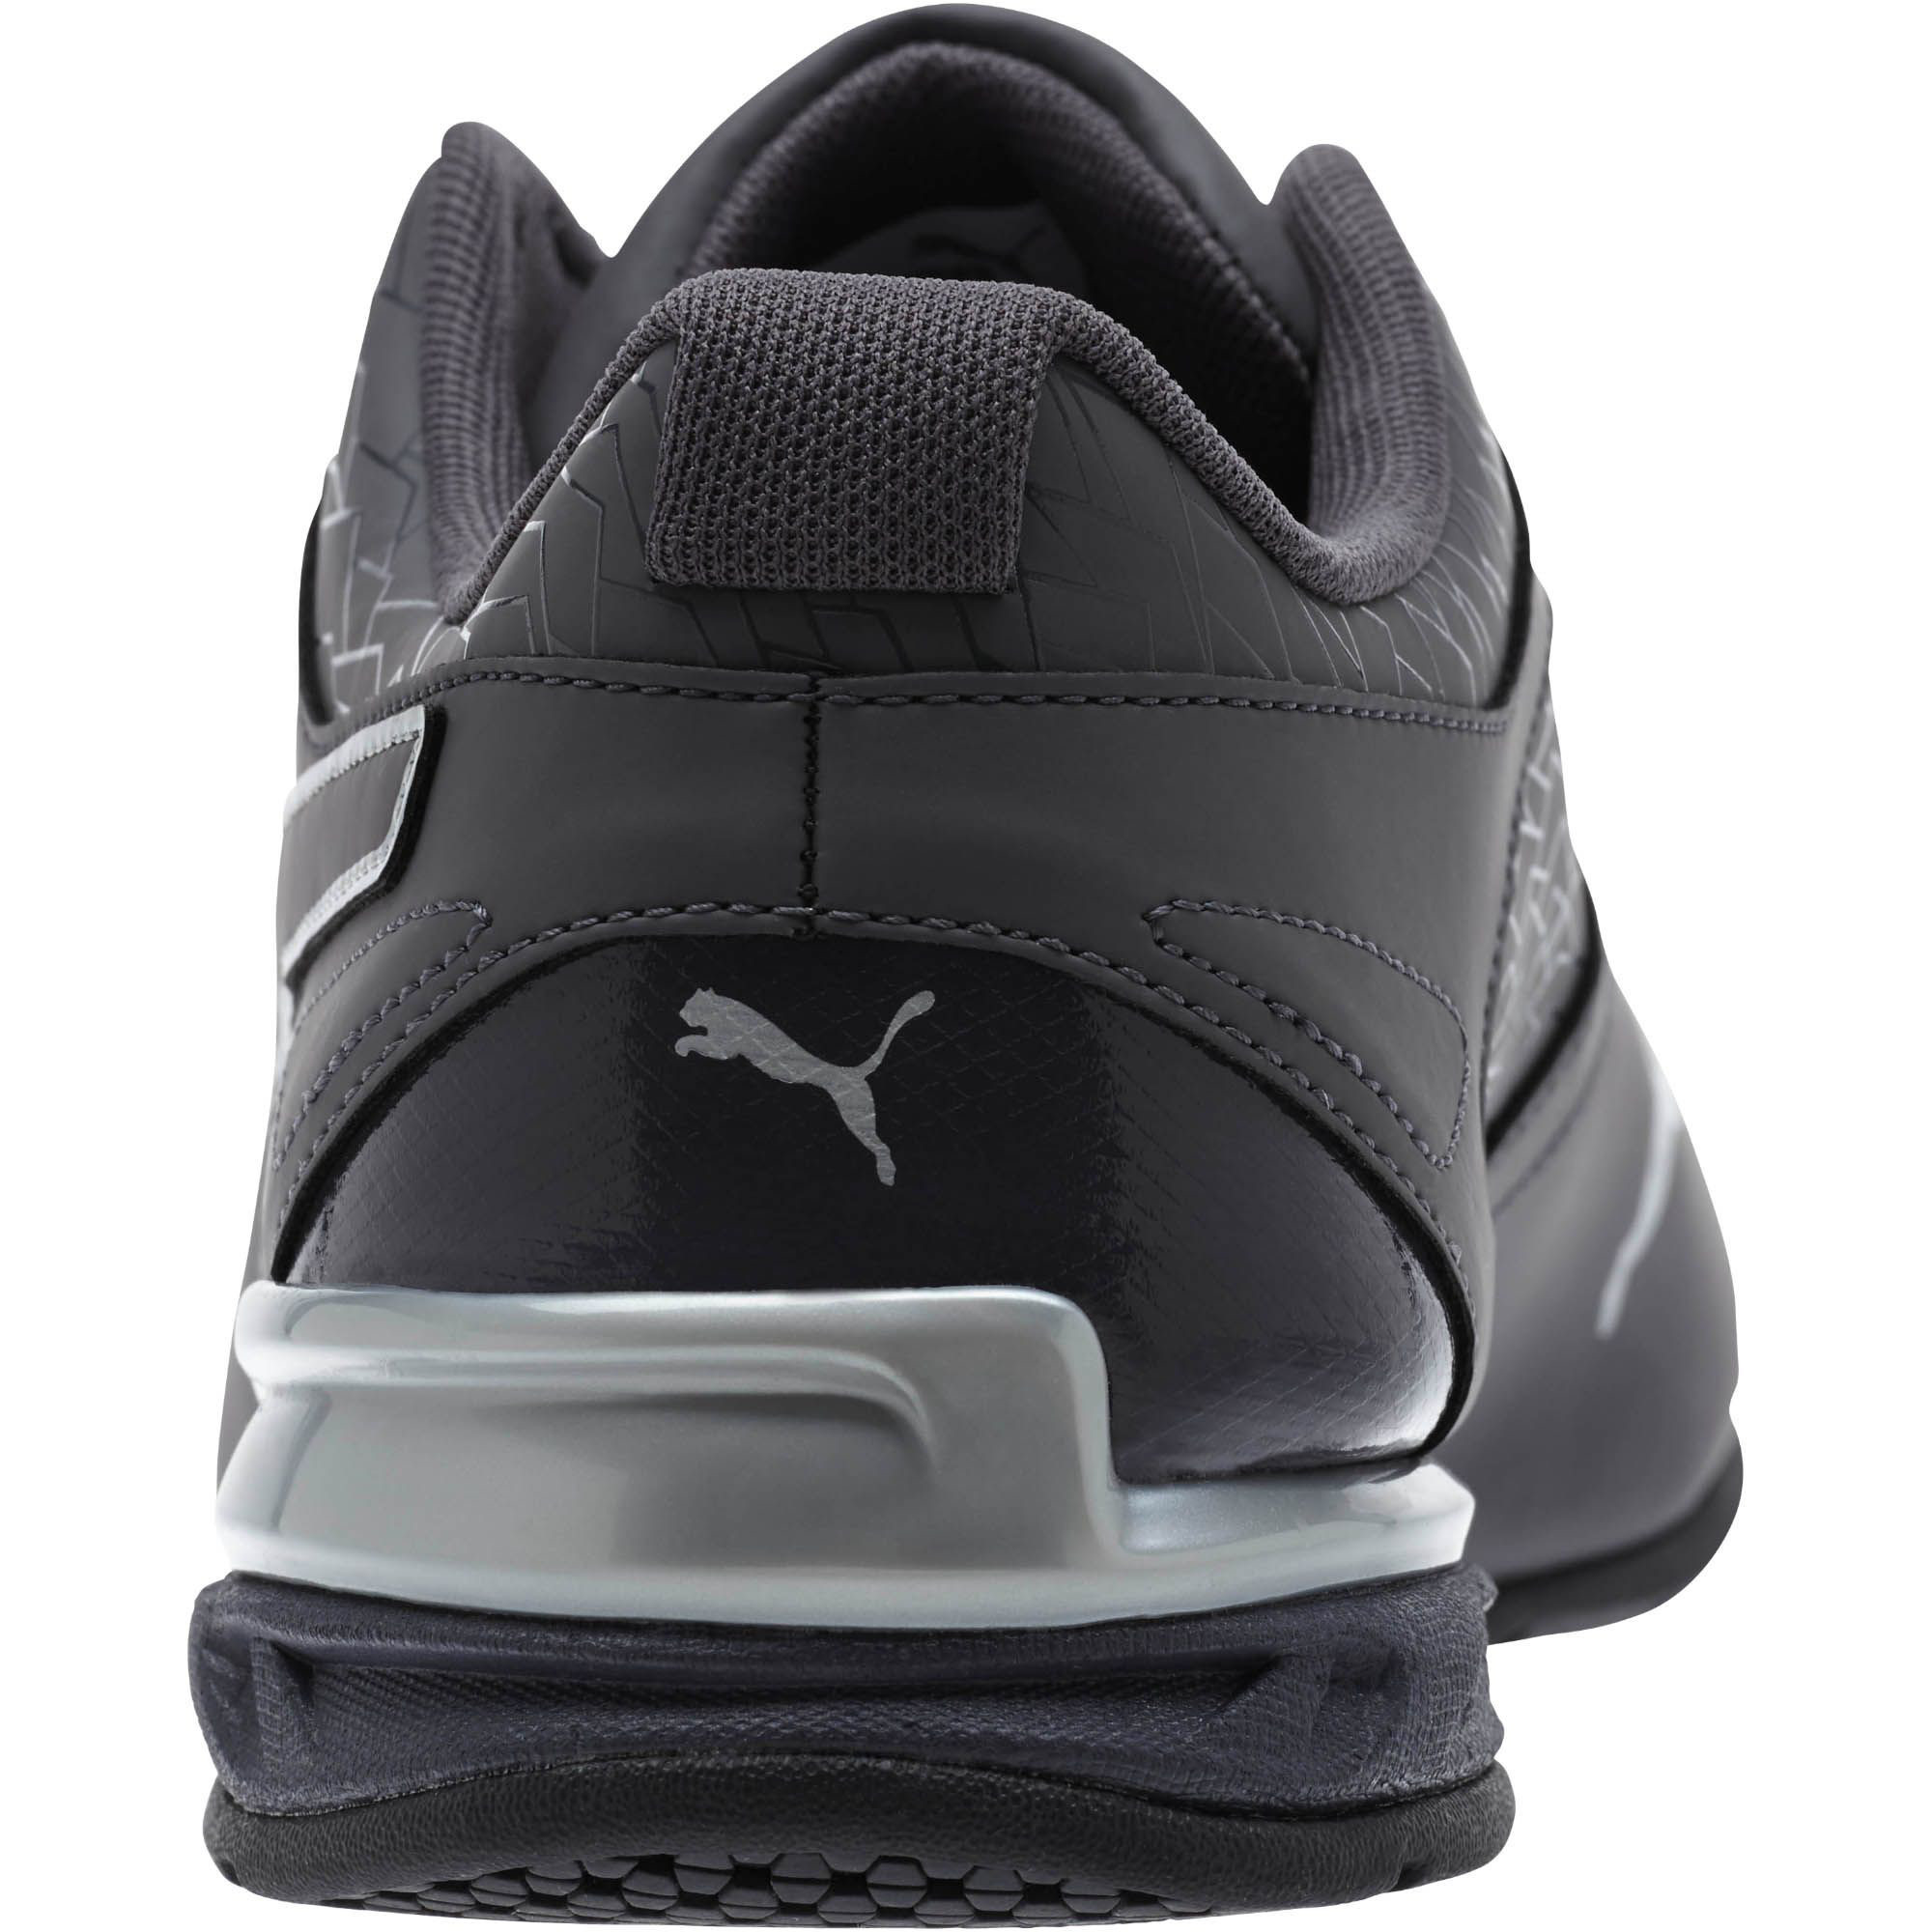 thumbnail 6 - PUMA Men's Tazon 6 Fracture FM Sneakers